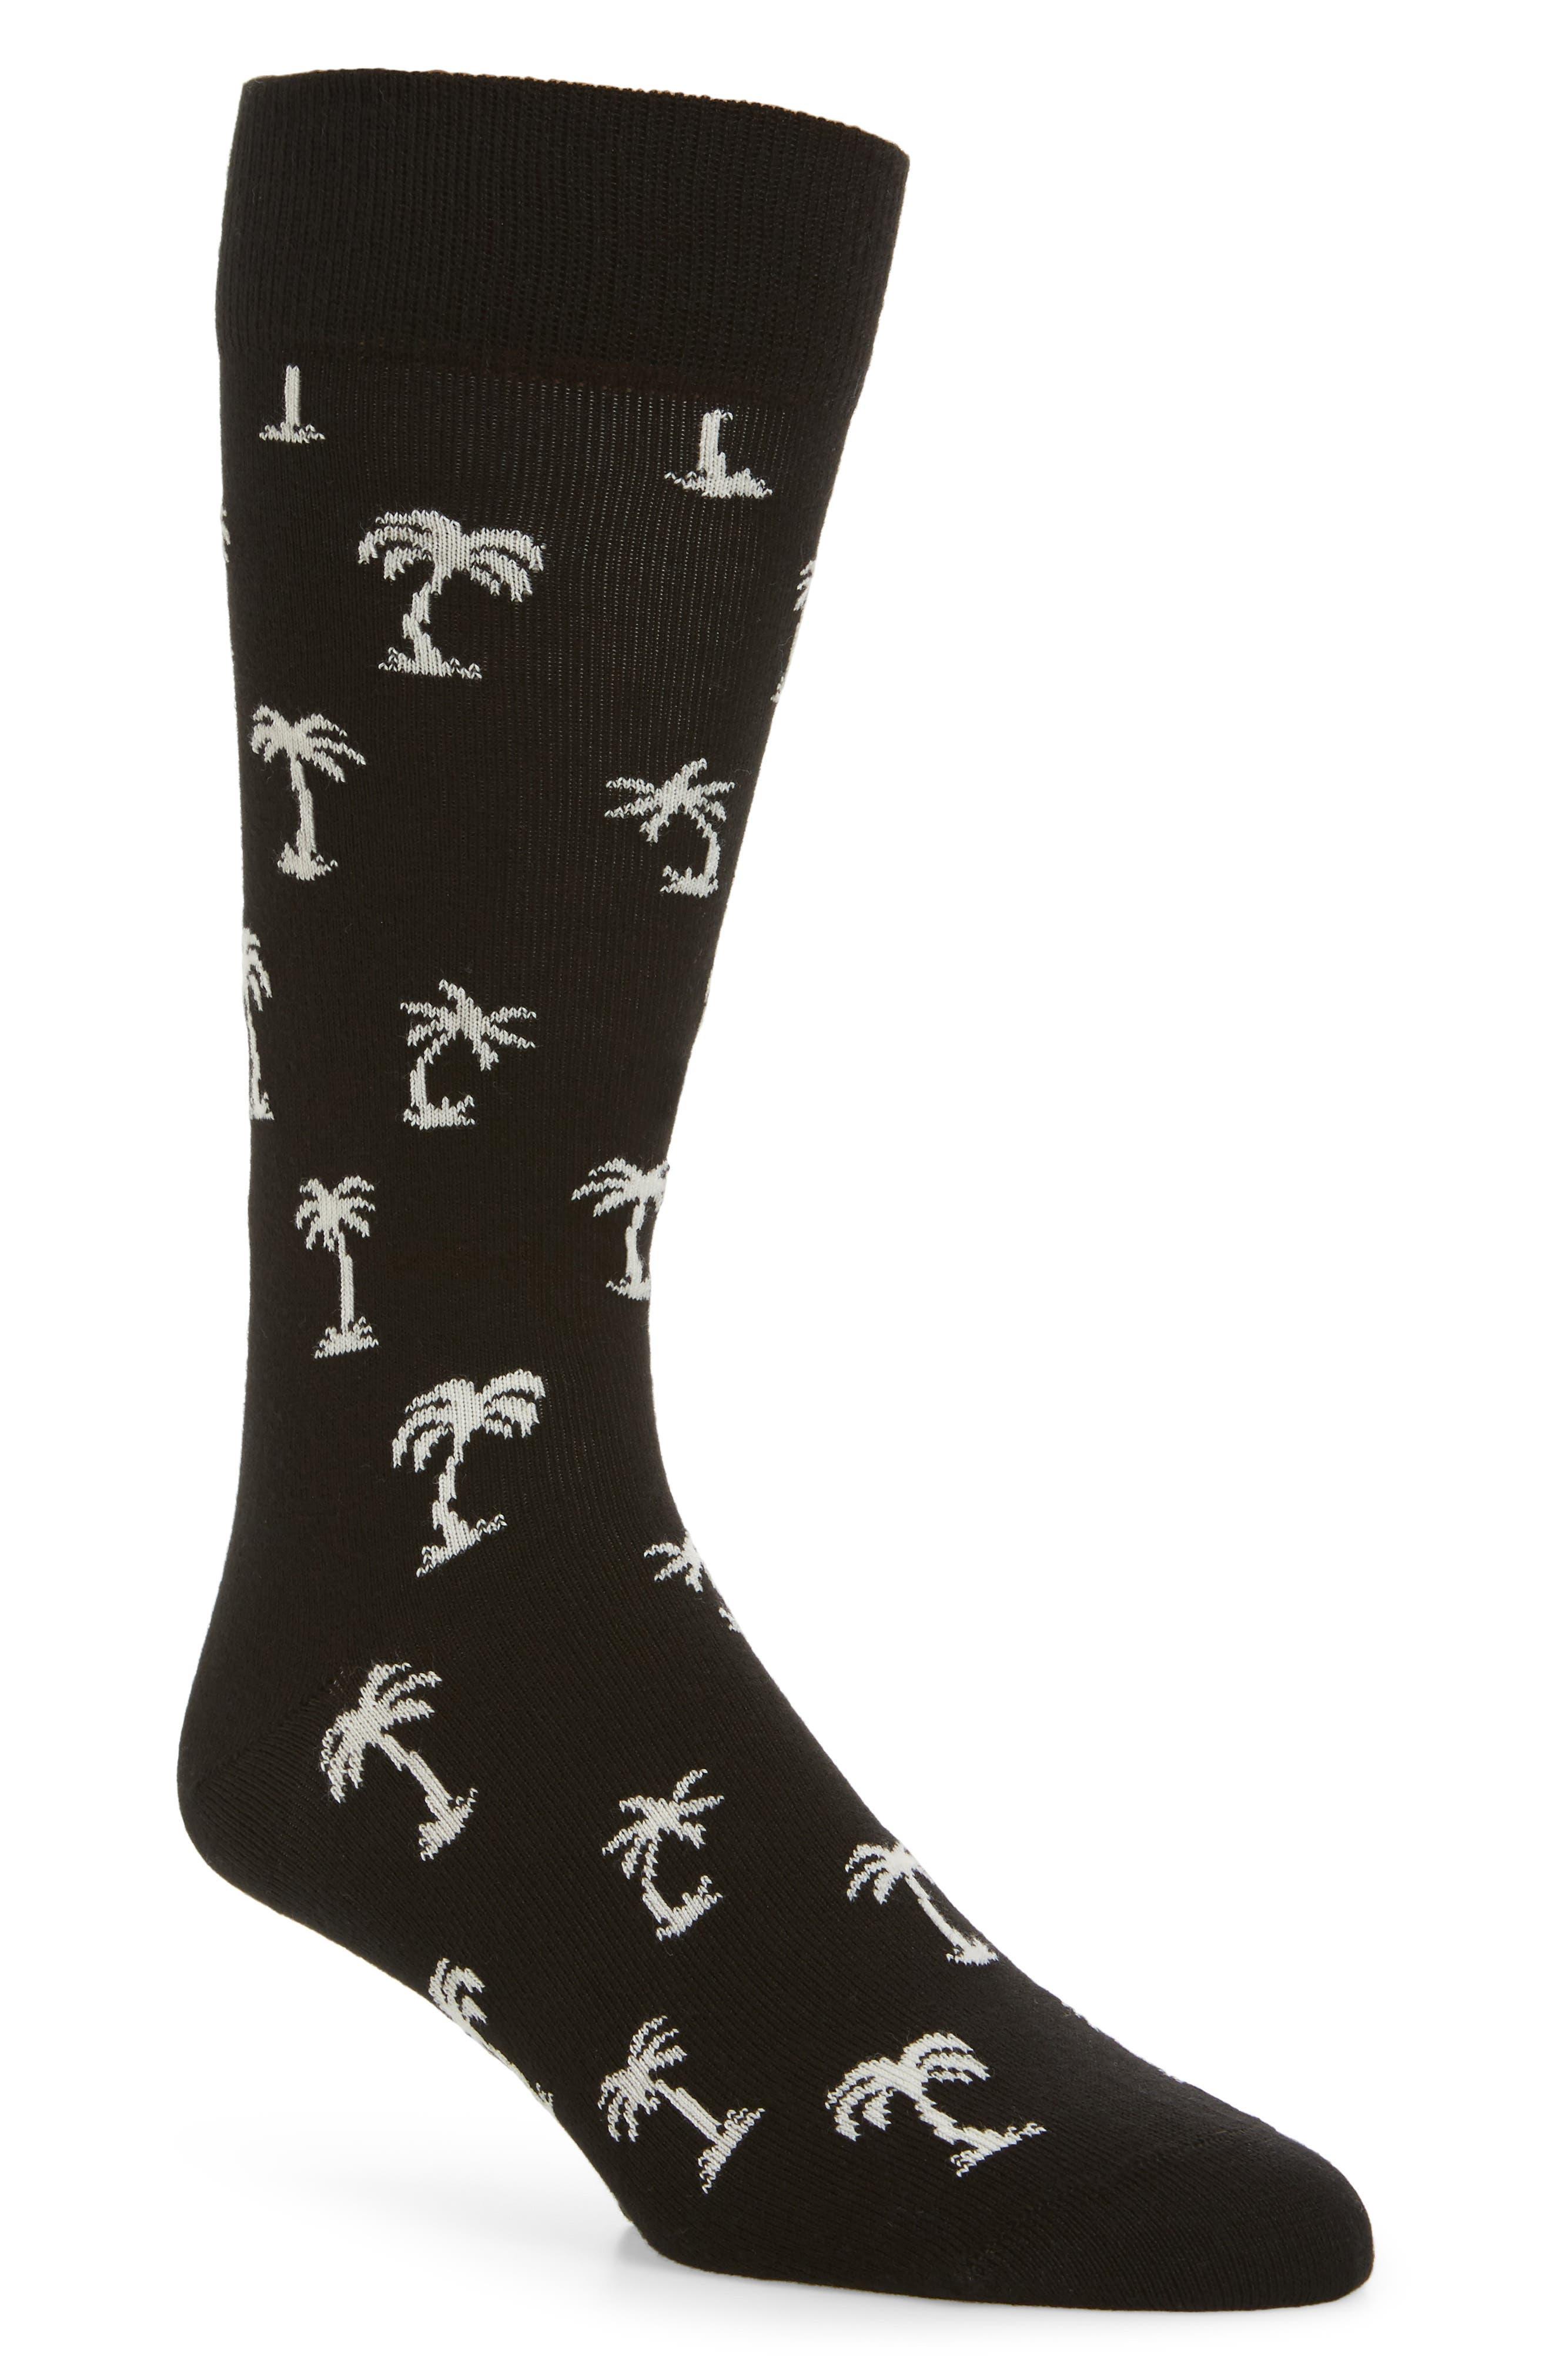 Palm Beach Crew Socks,                             Main thumbnail 1, color,                             Black/ White